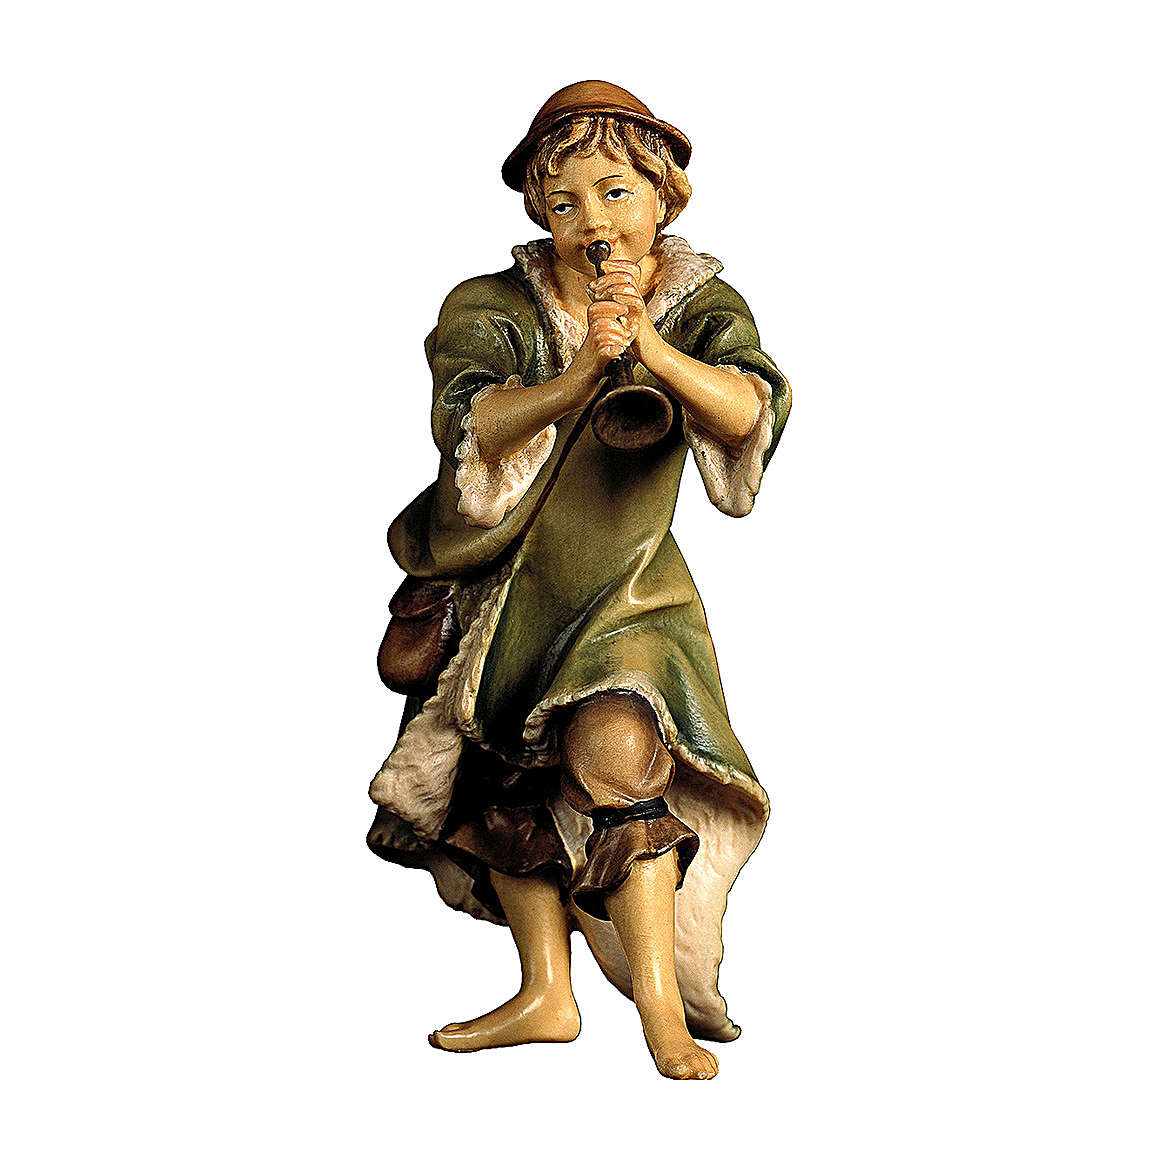 Pastore con tromba presepe Original legno dipinto Valgardena 10 cm 4